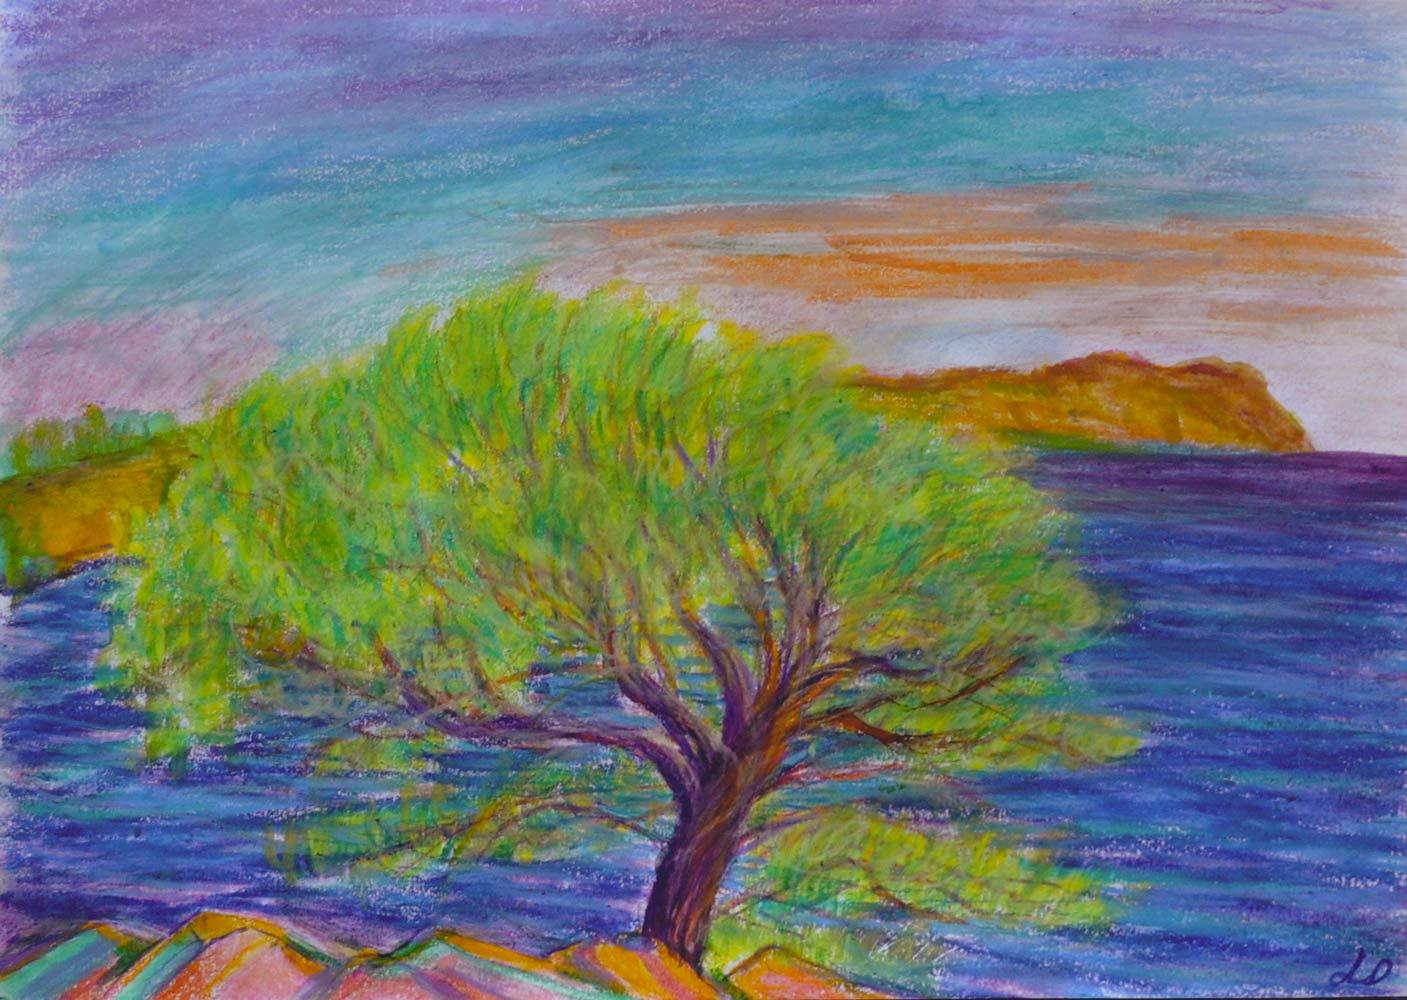 Cassis, les calanques no. 1, sketch. Watercolor wax pastel on paper, 21x30, 2018